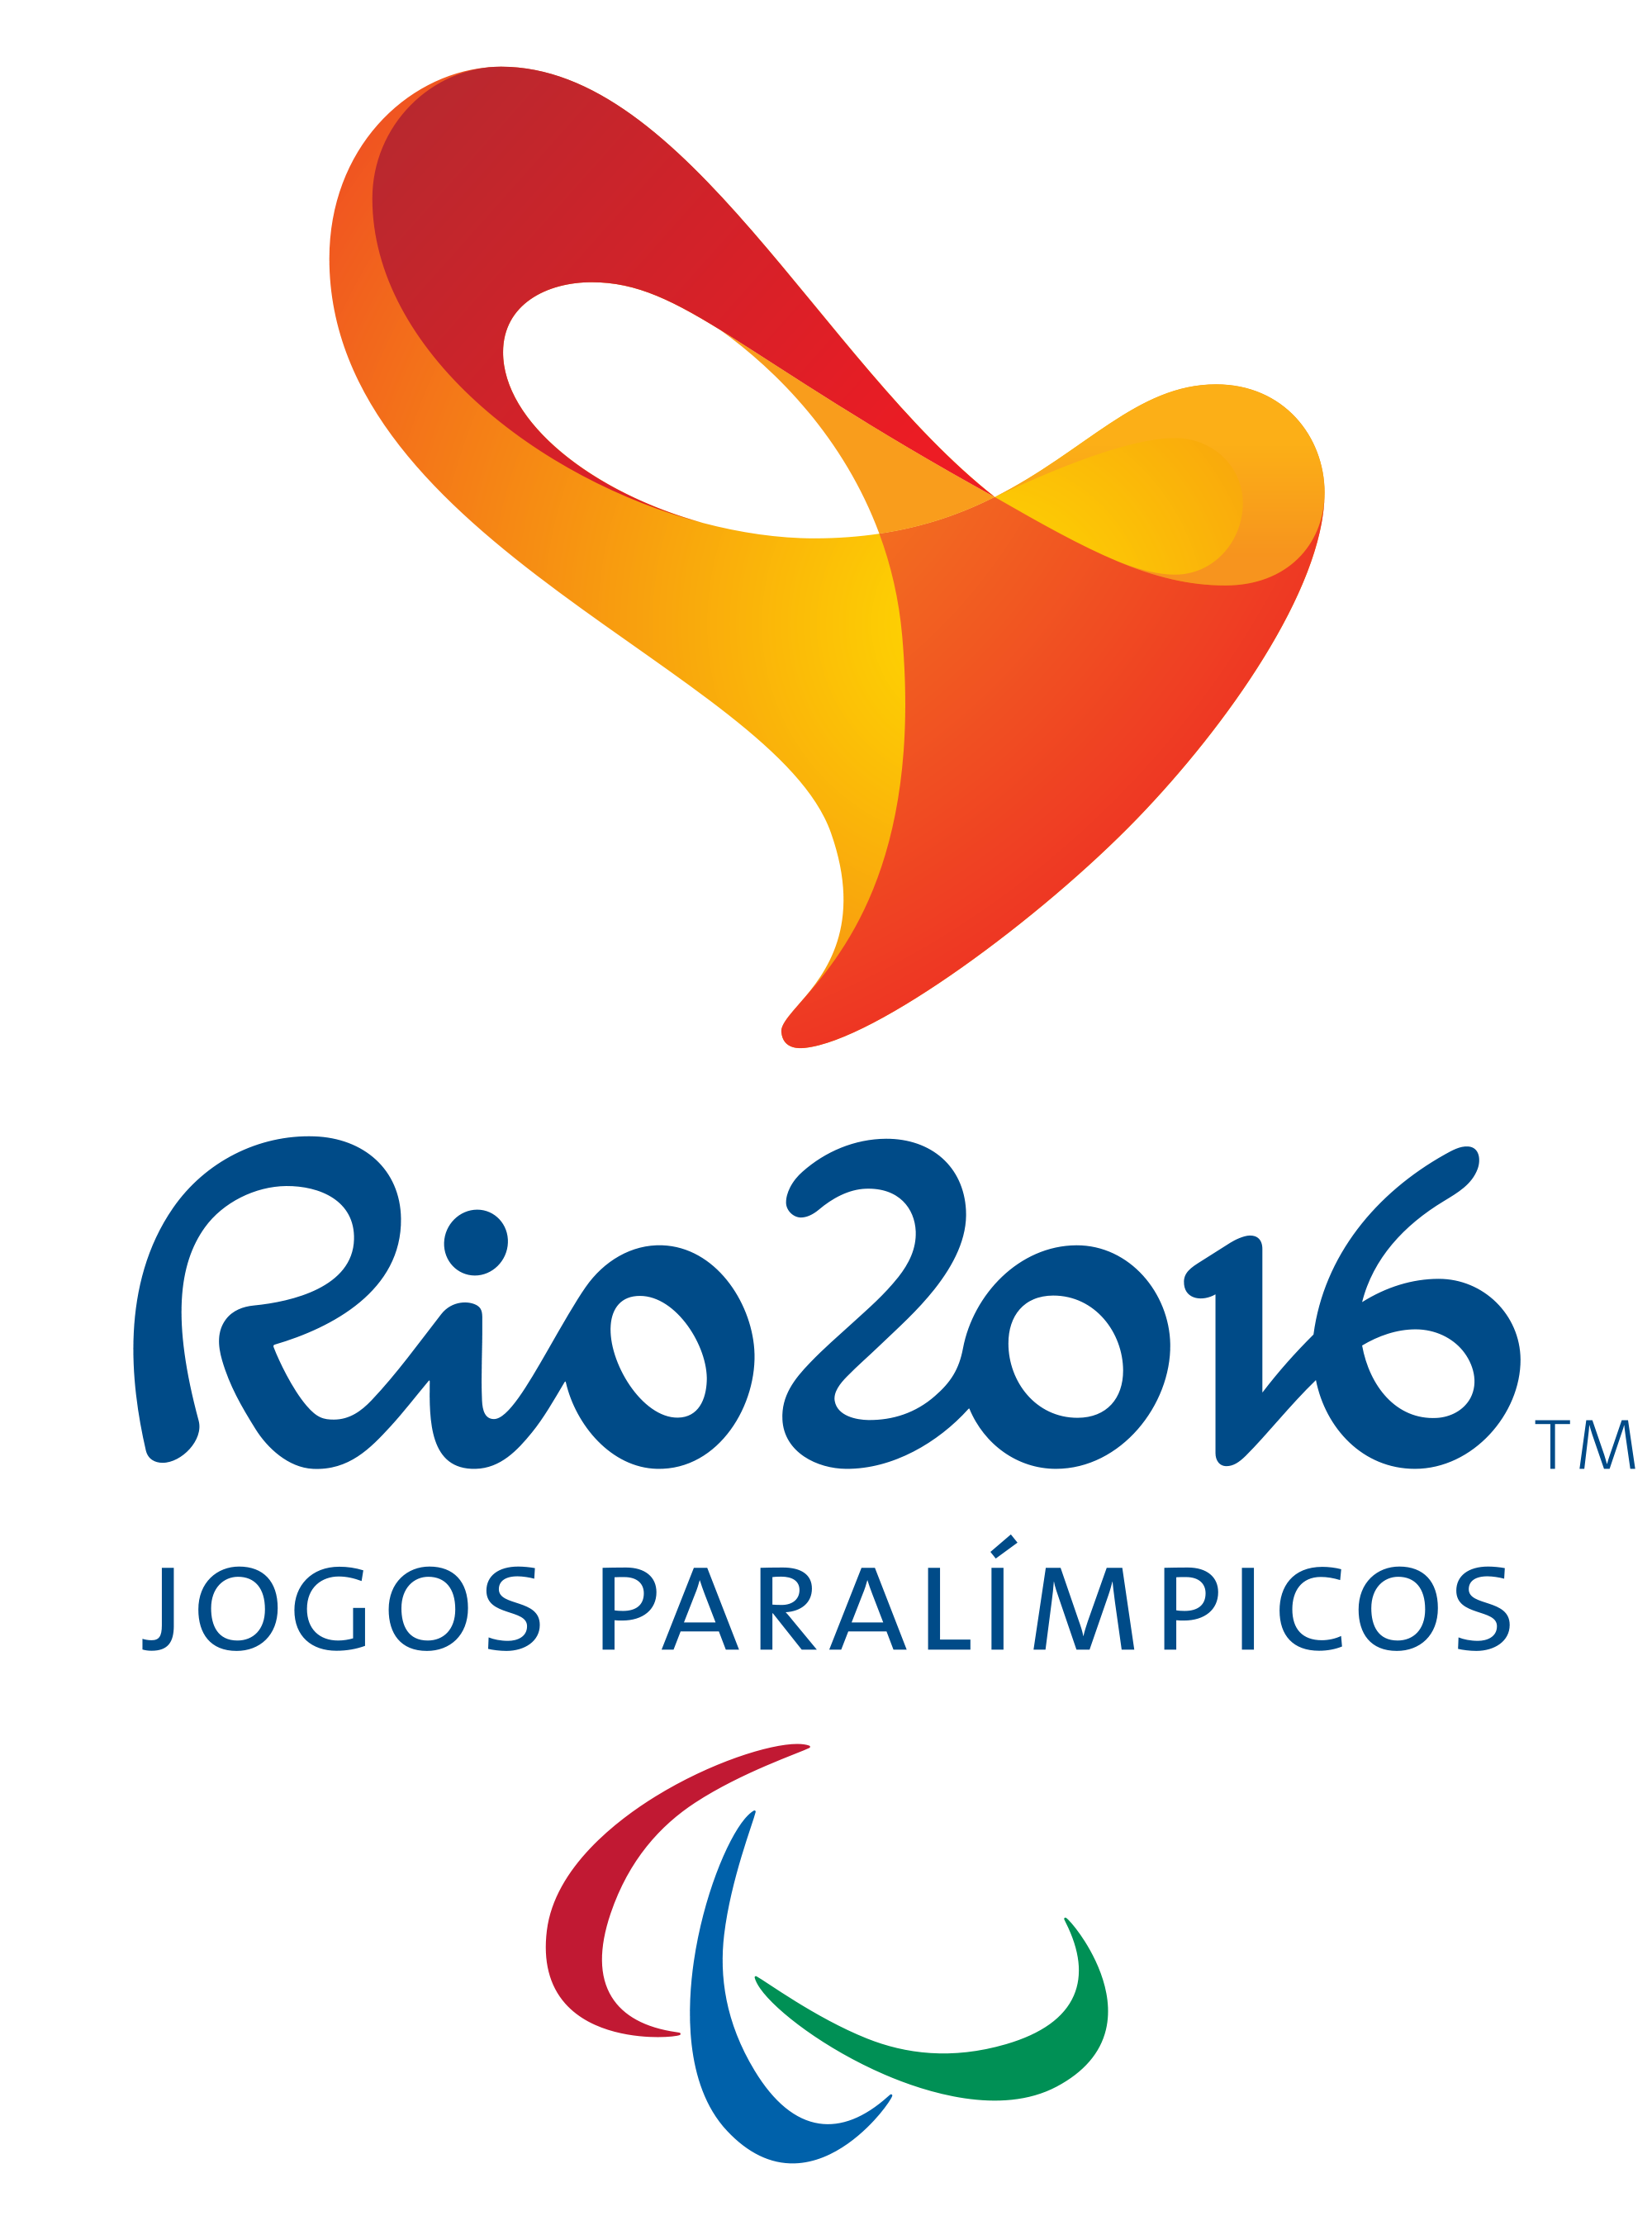 Paralimpiadas-Rio-2016-Logo-3